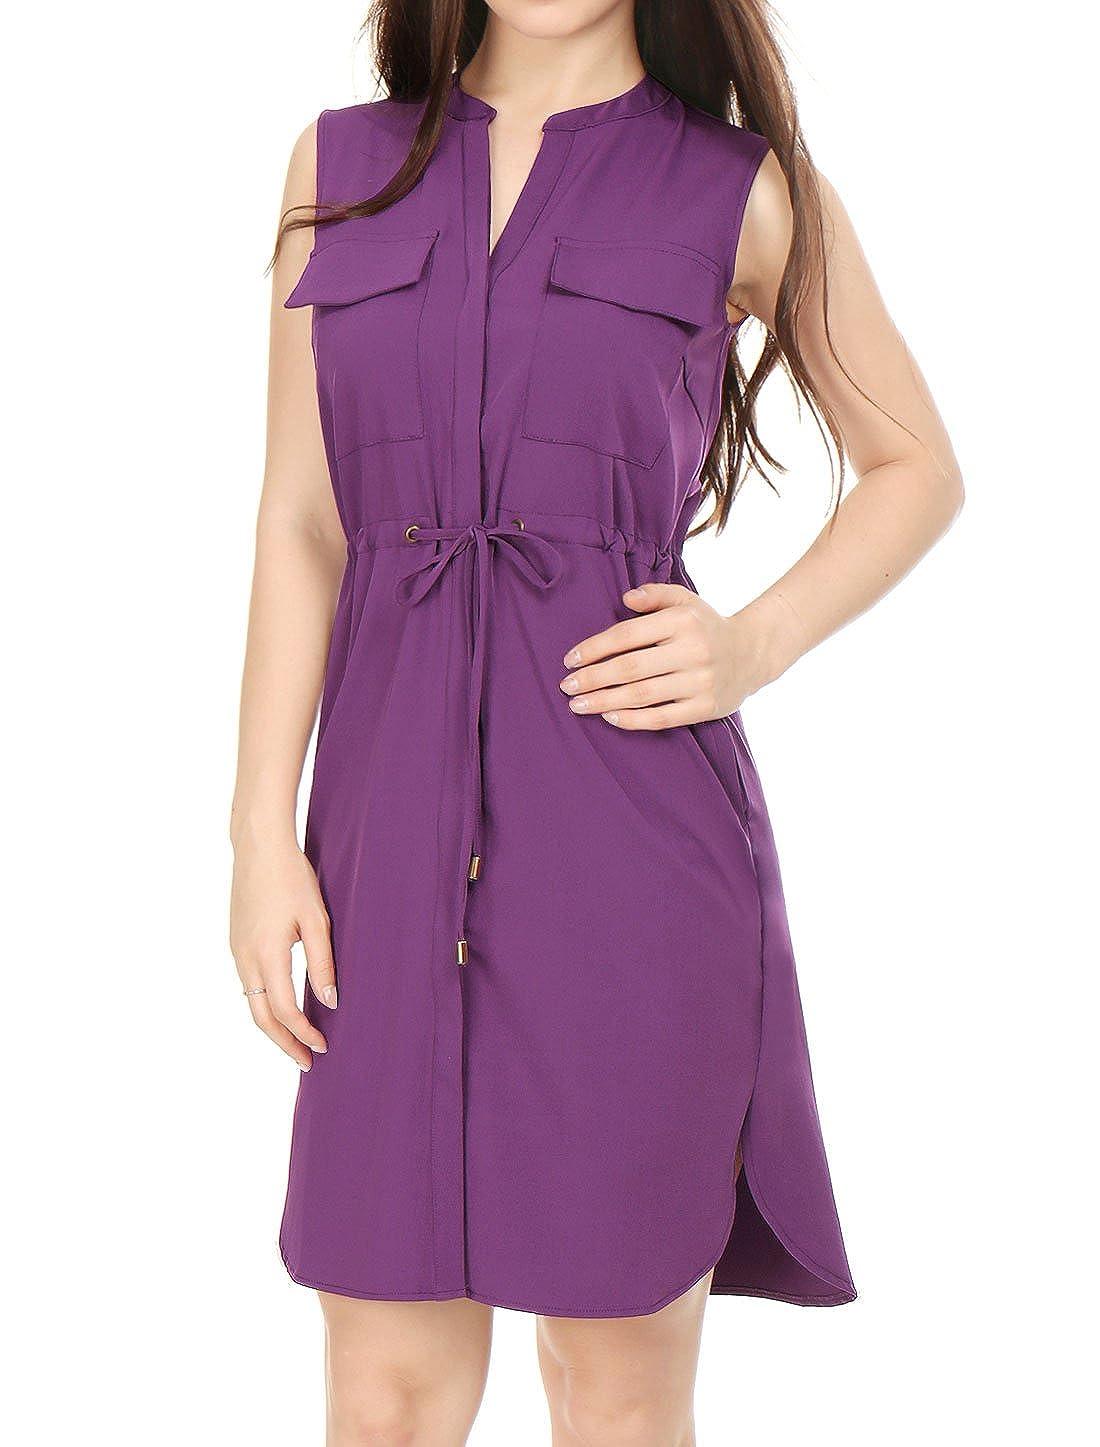 b99ce83774154 Allegra K Women's Sleeveless Drawstring Tie Waist Dress with Pockets at  Amazon Women's Clothing store: